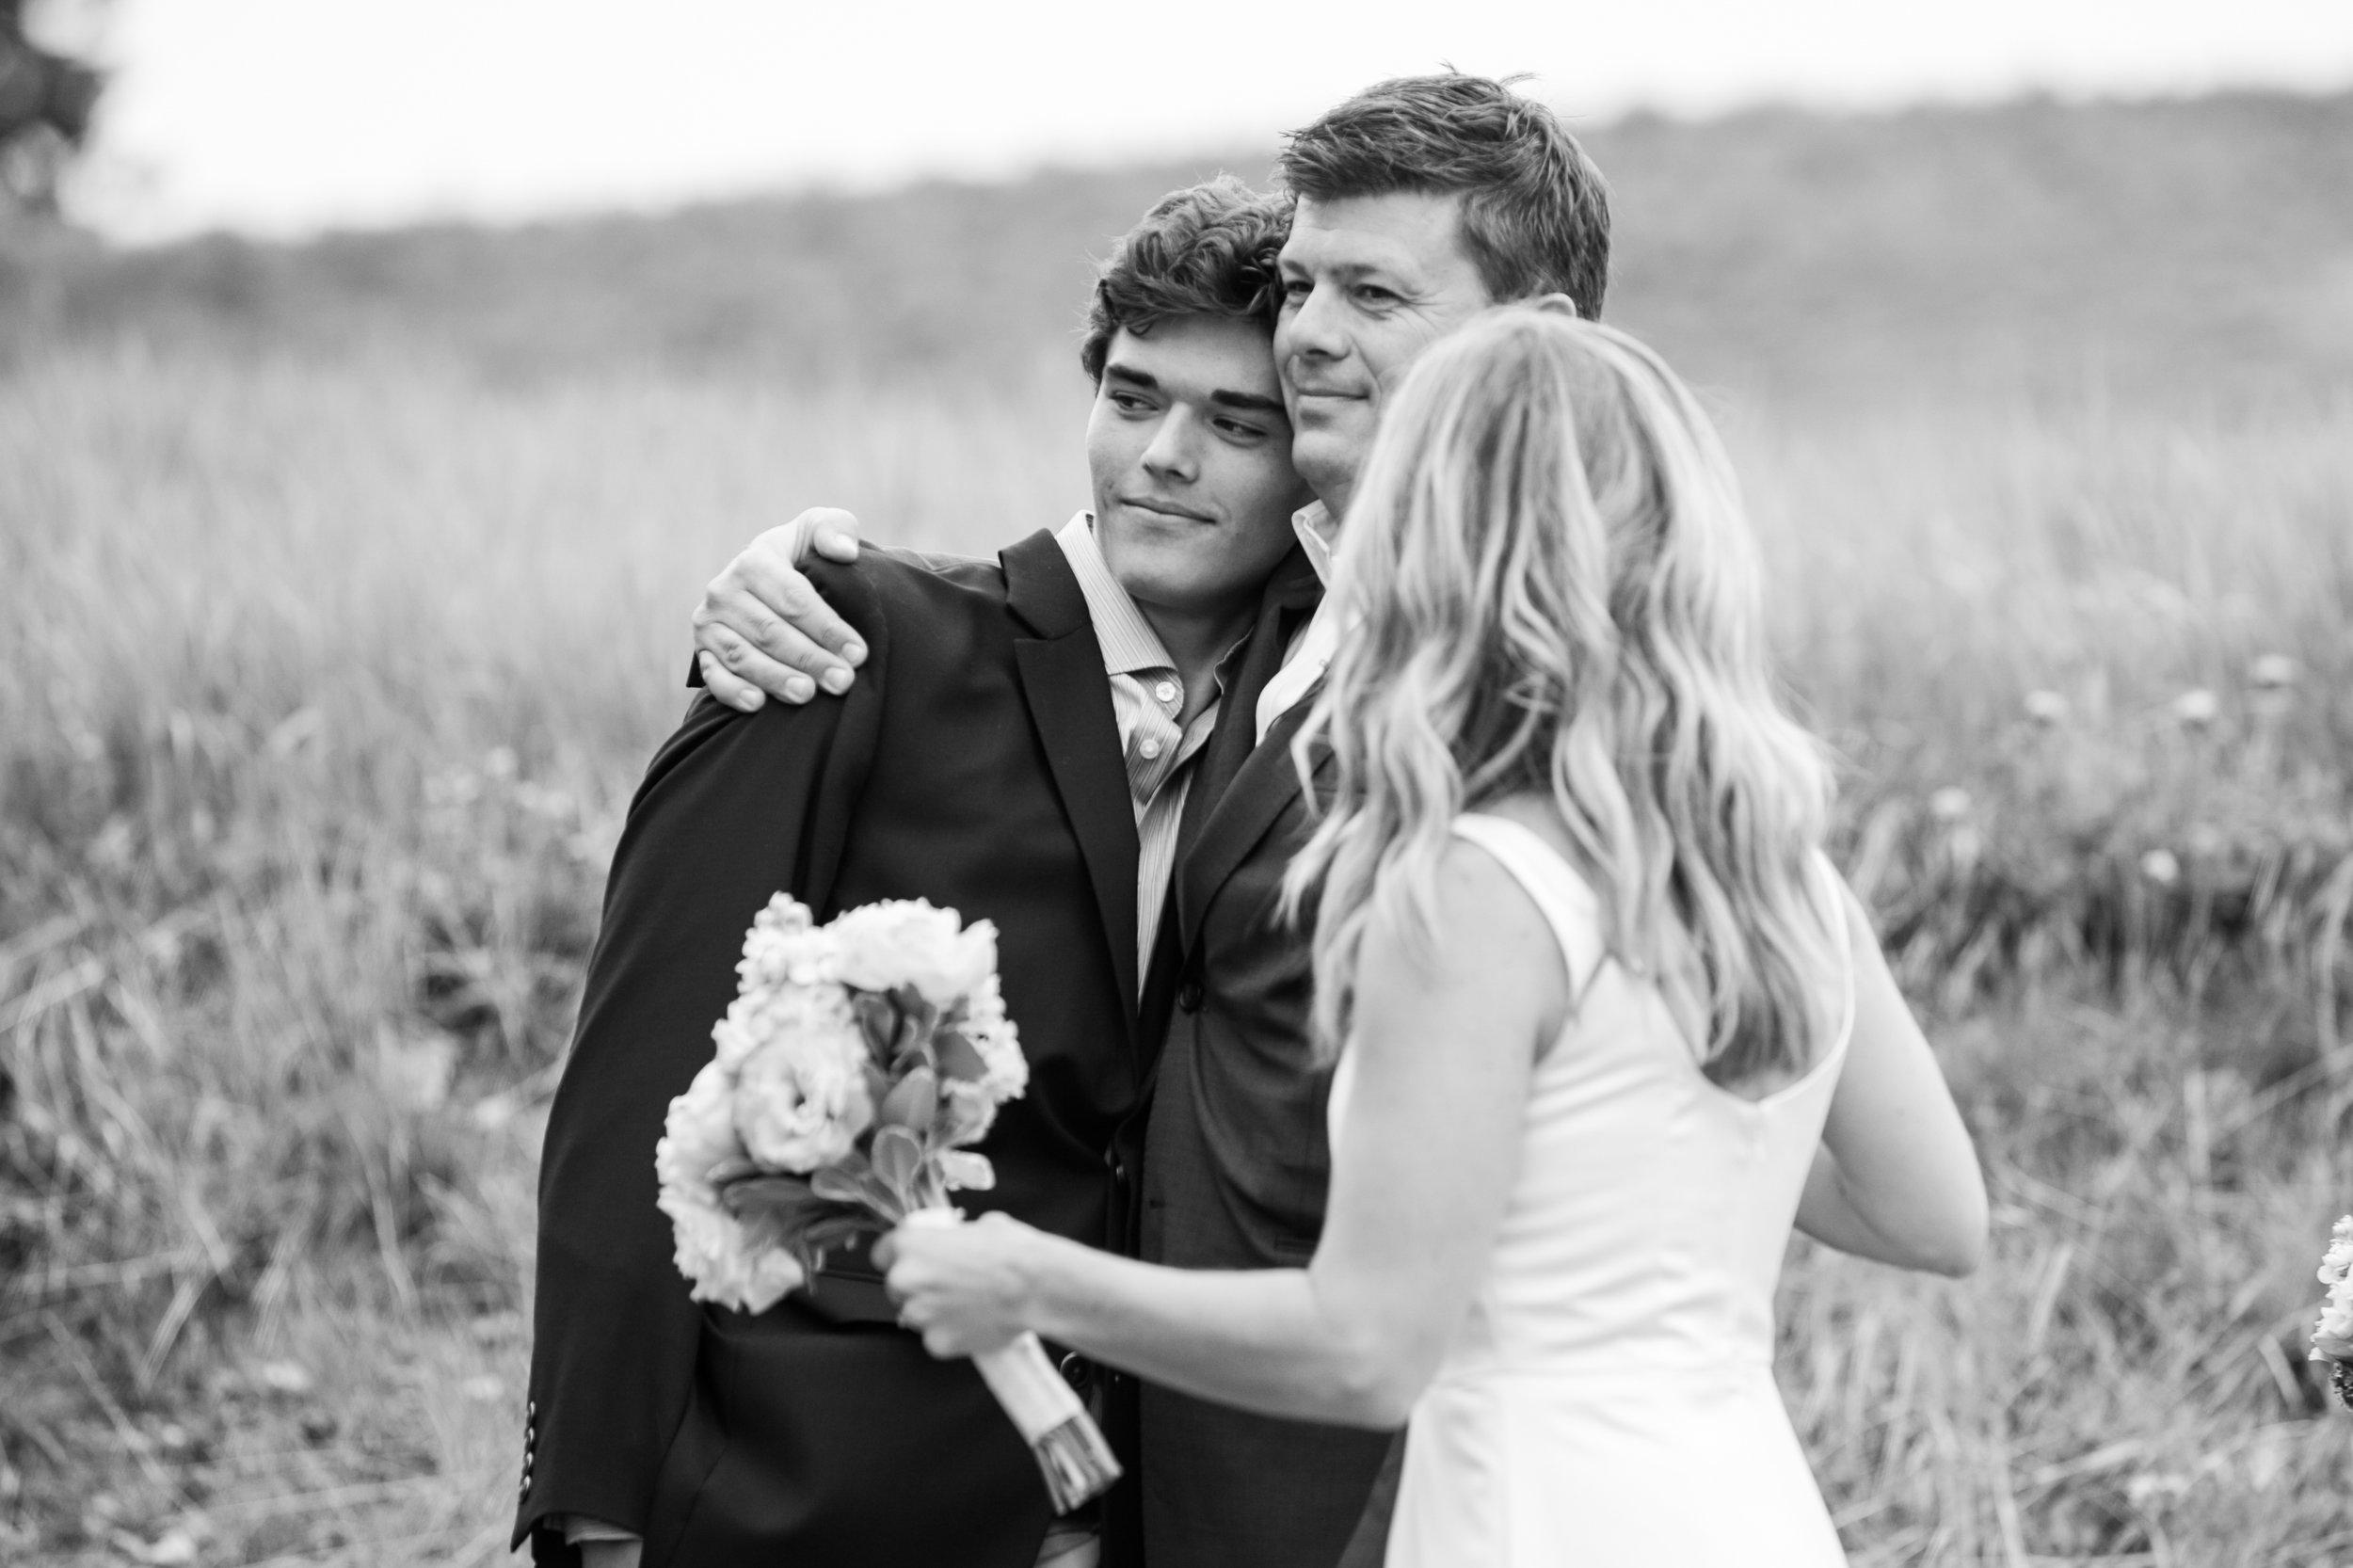 Beaver-creek-wedding-deck-wedding-axelphoto.jpg